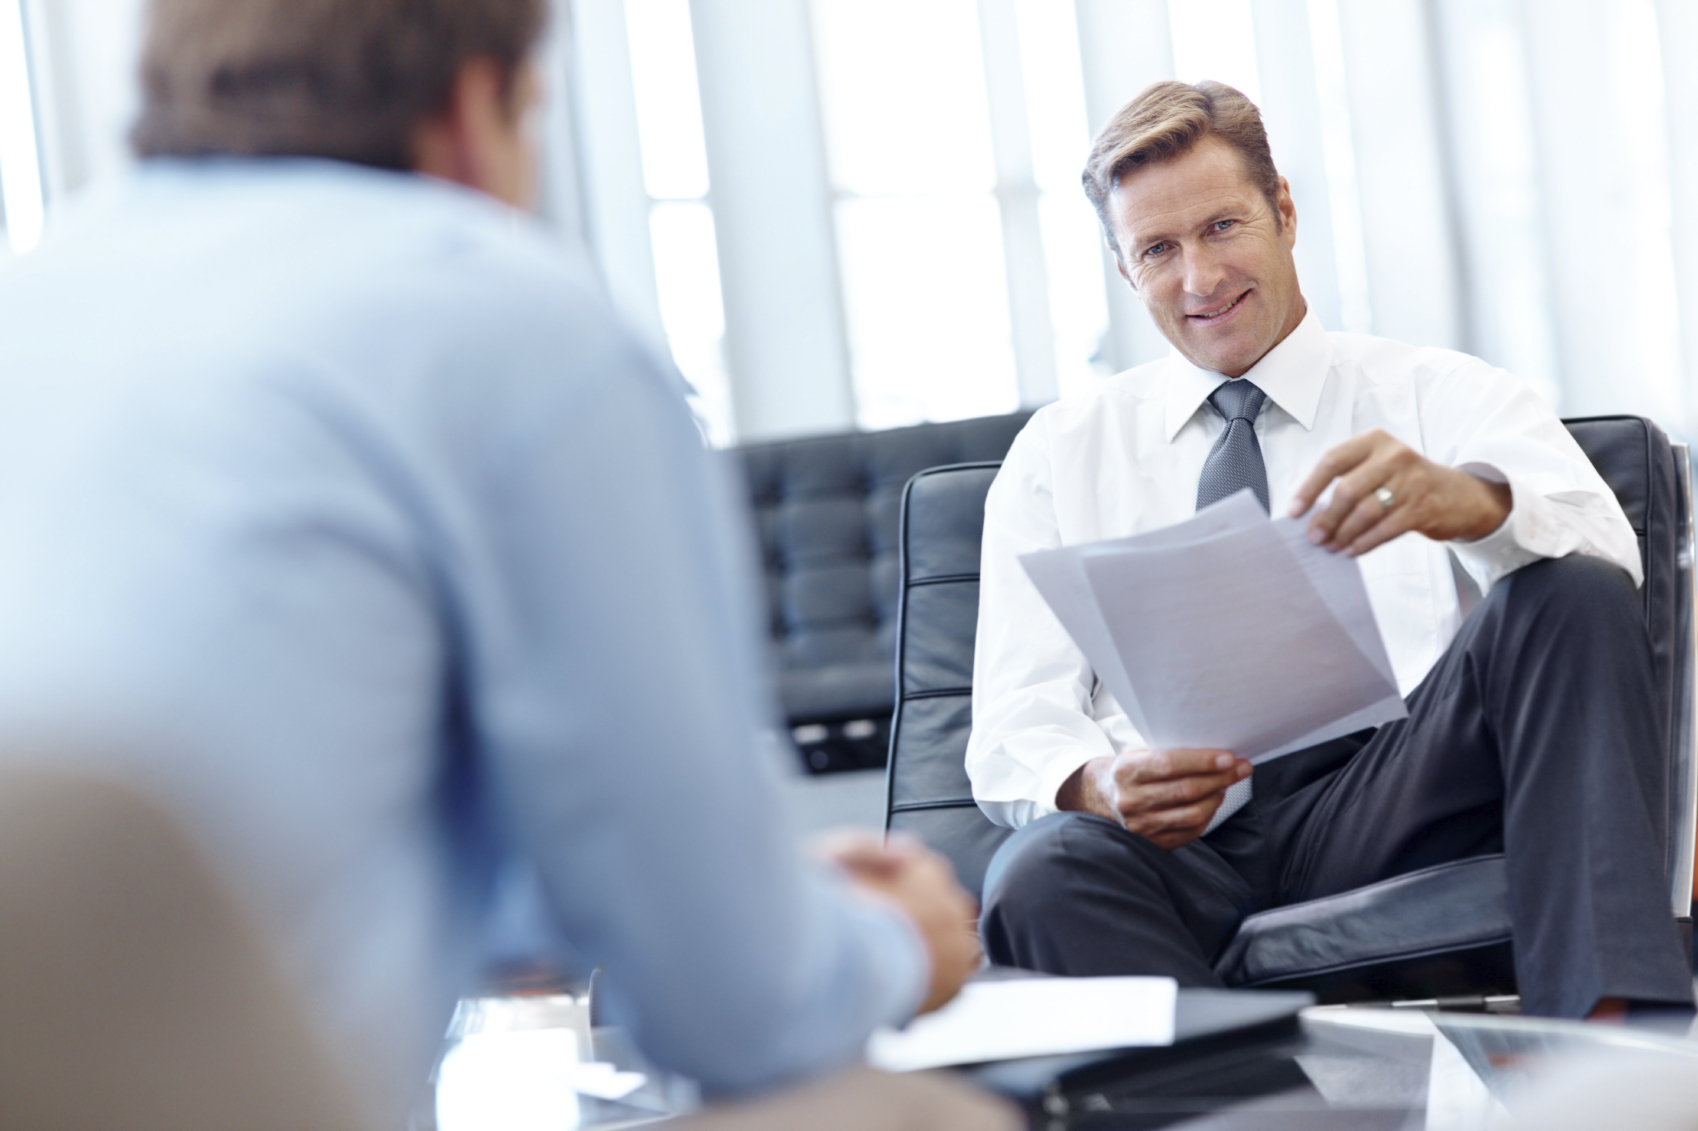 executive-interview